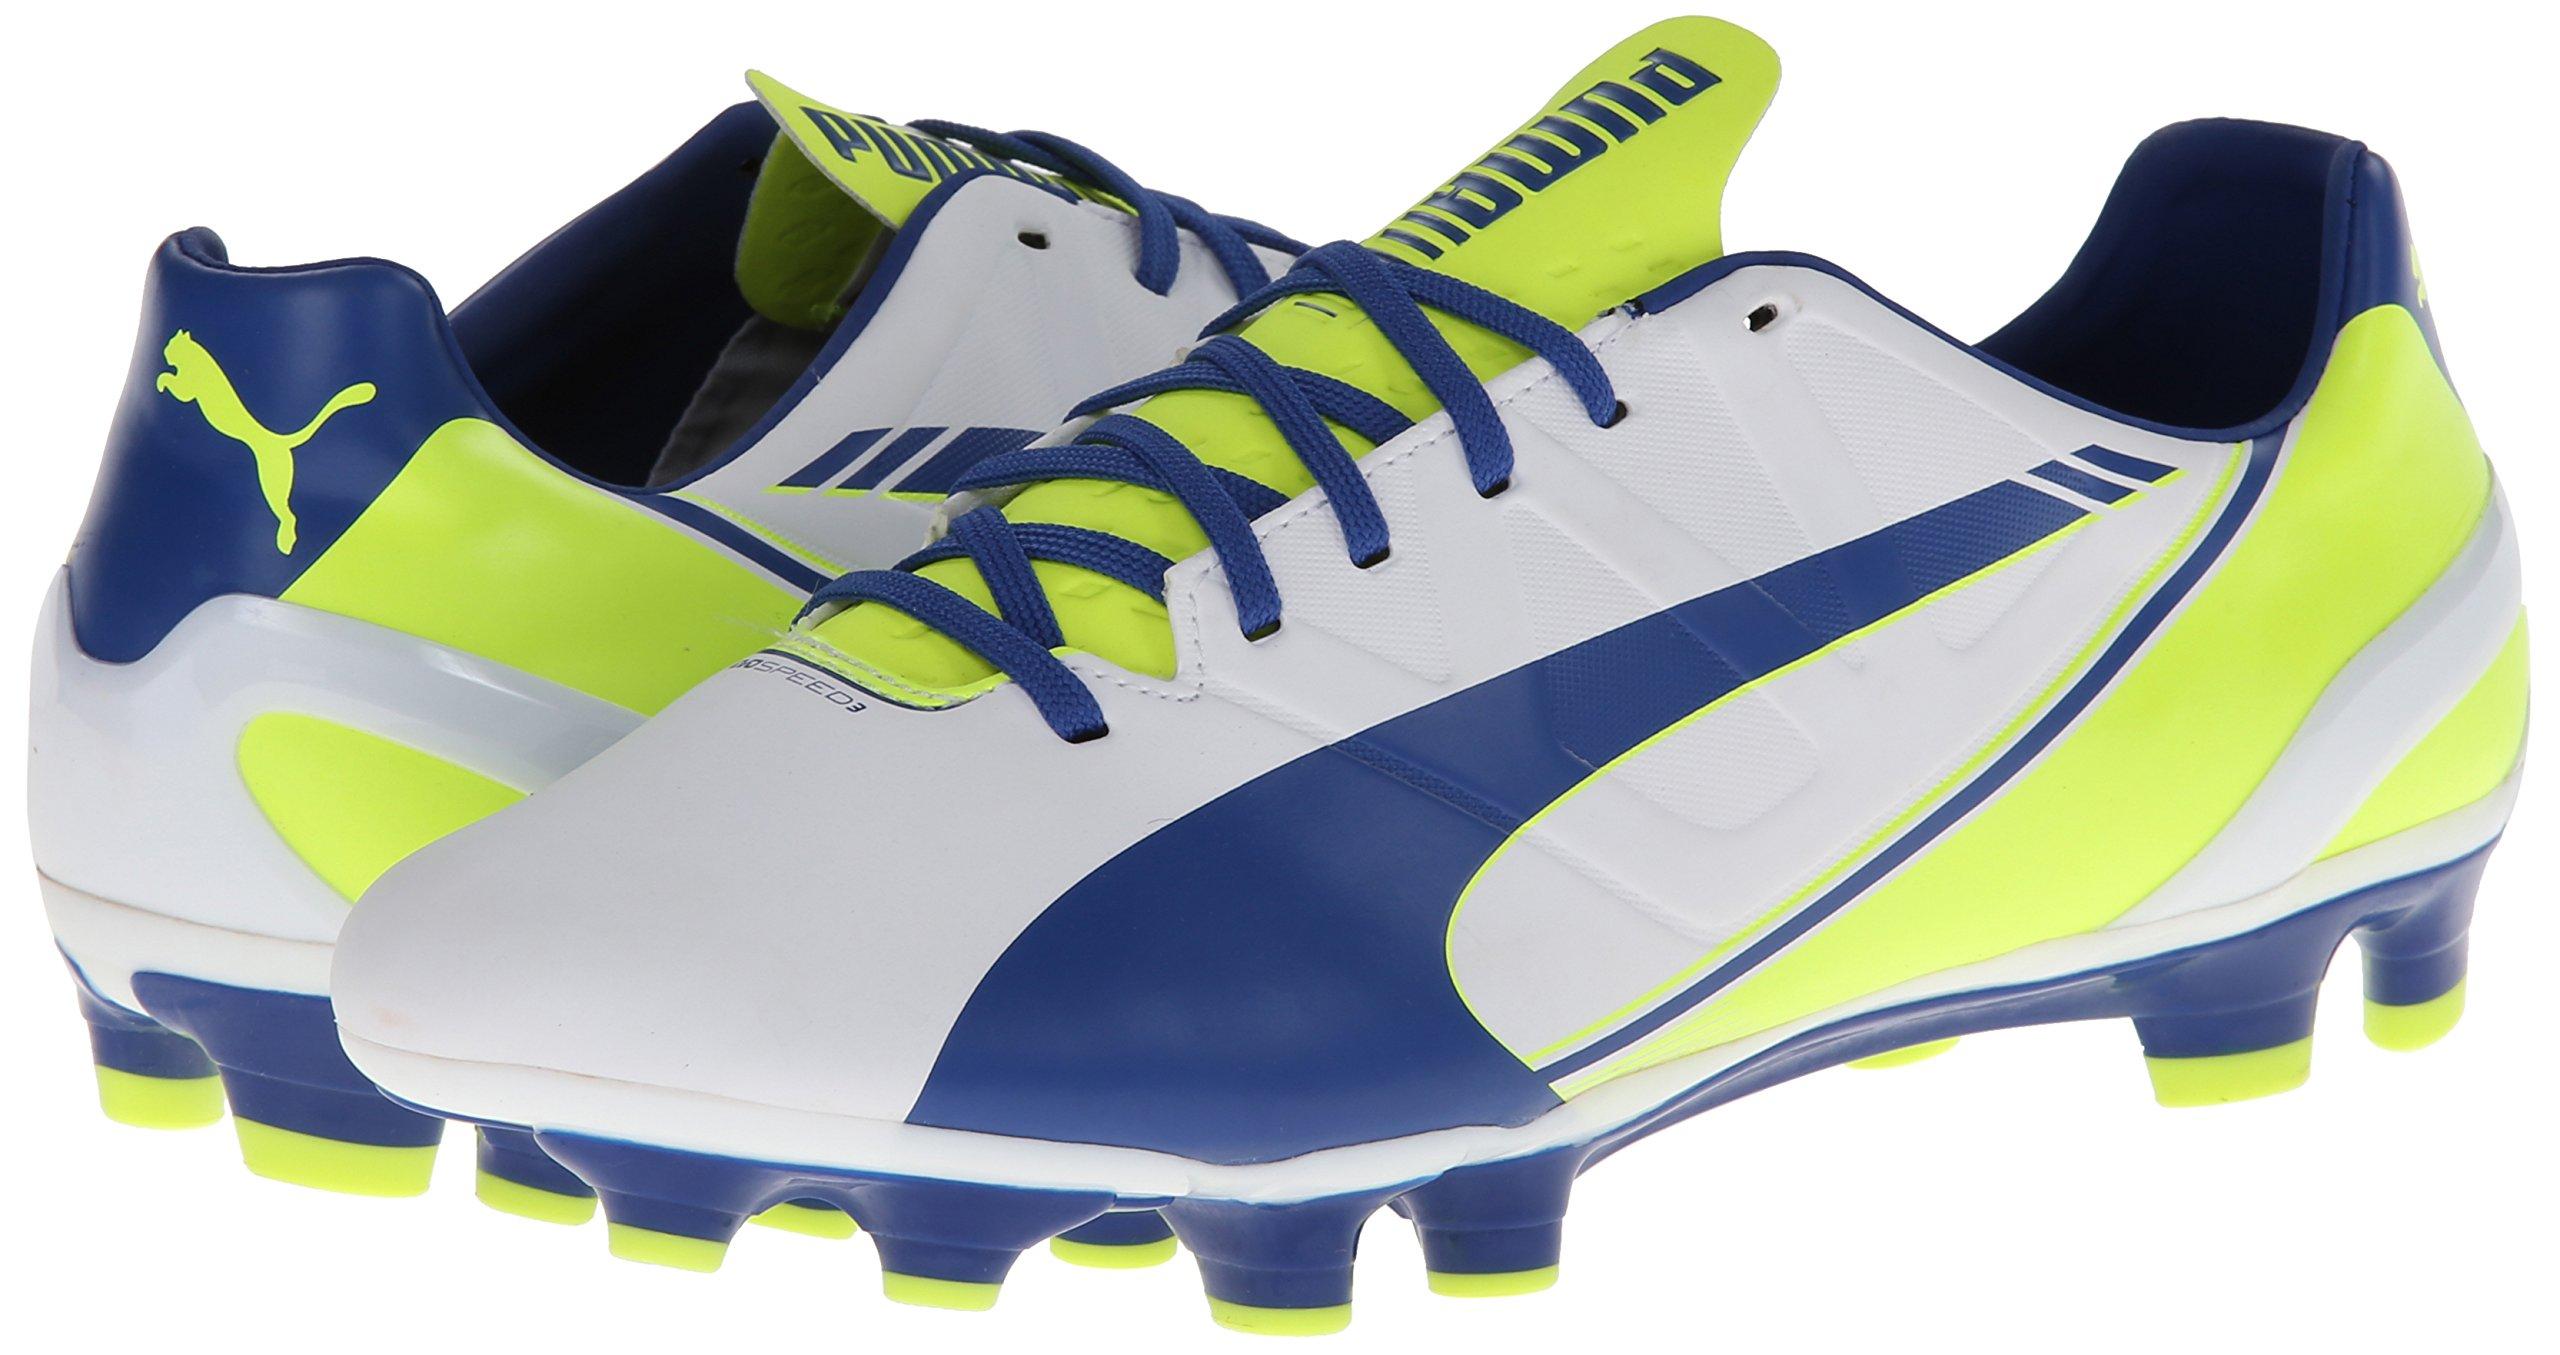 PUMA Women's Evo Speed 3.3 Firm Ground Soccer Shoe,White/Snorkel Blue/Fluorescent Yellow,8 B US by PUMA (Image #6)